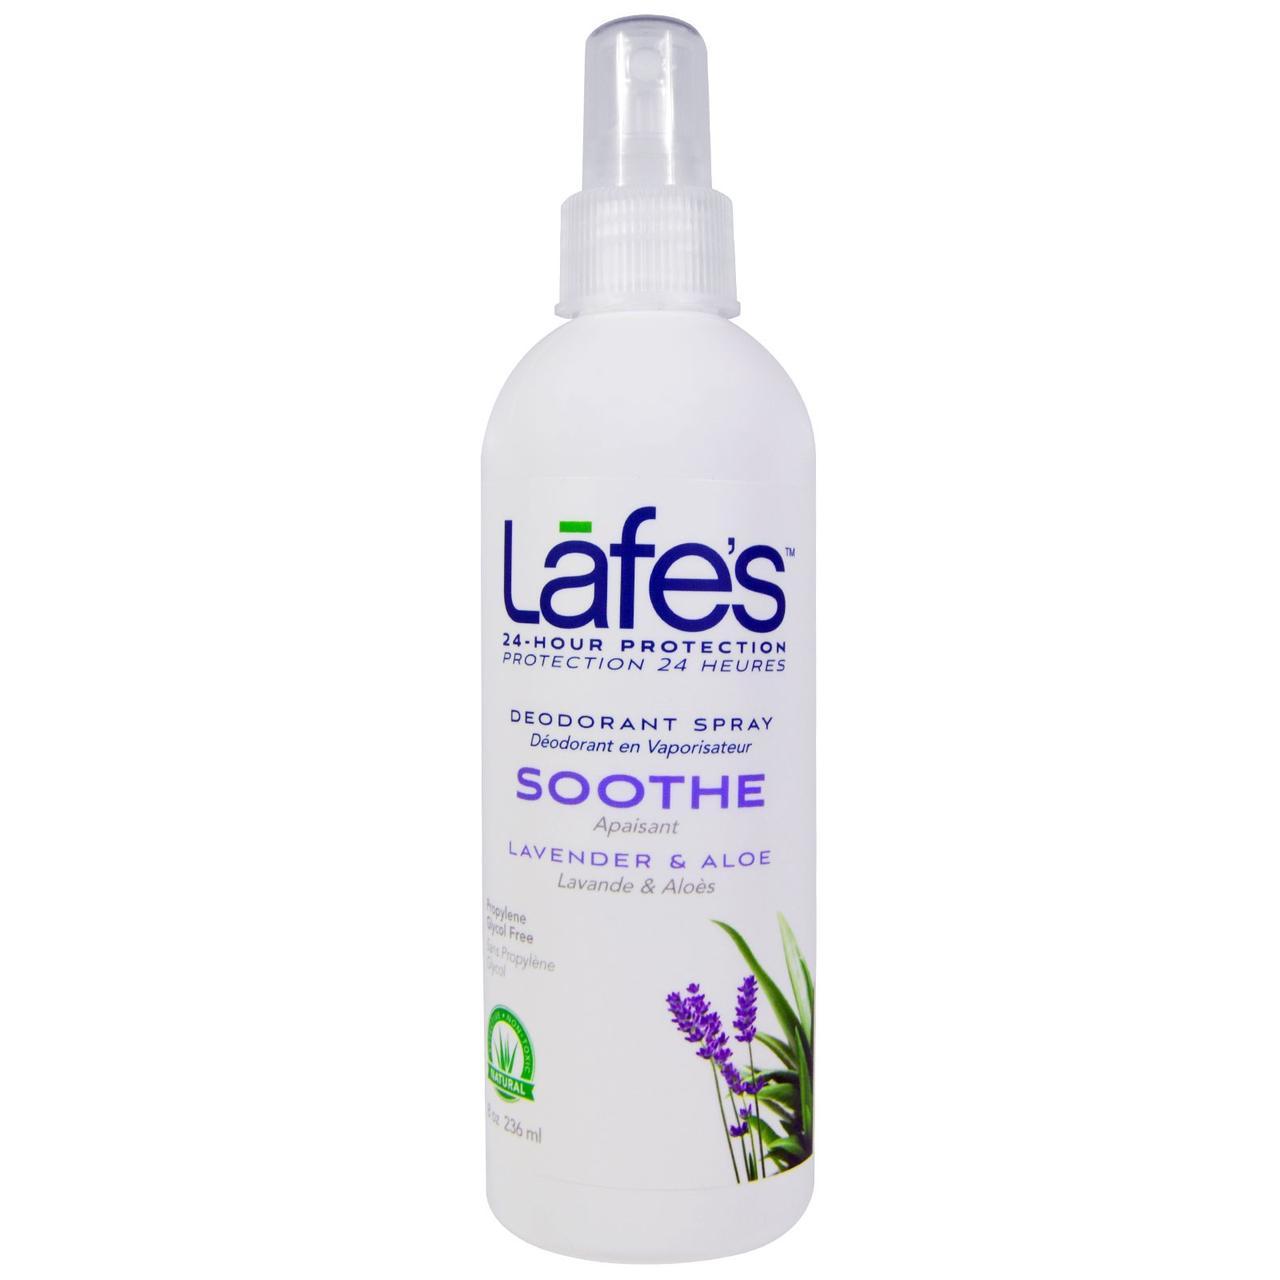 Lafes Natural Body Care, Дезодорант-спрей, смягчающий, лаванда и алоэ, 236 мл